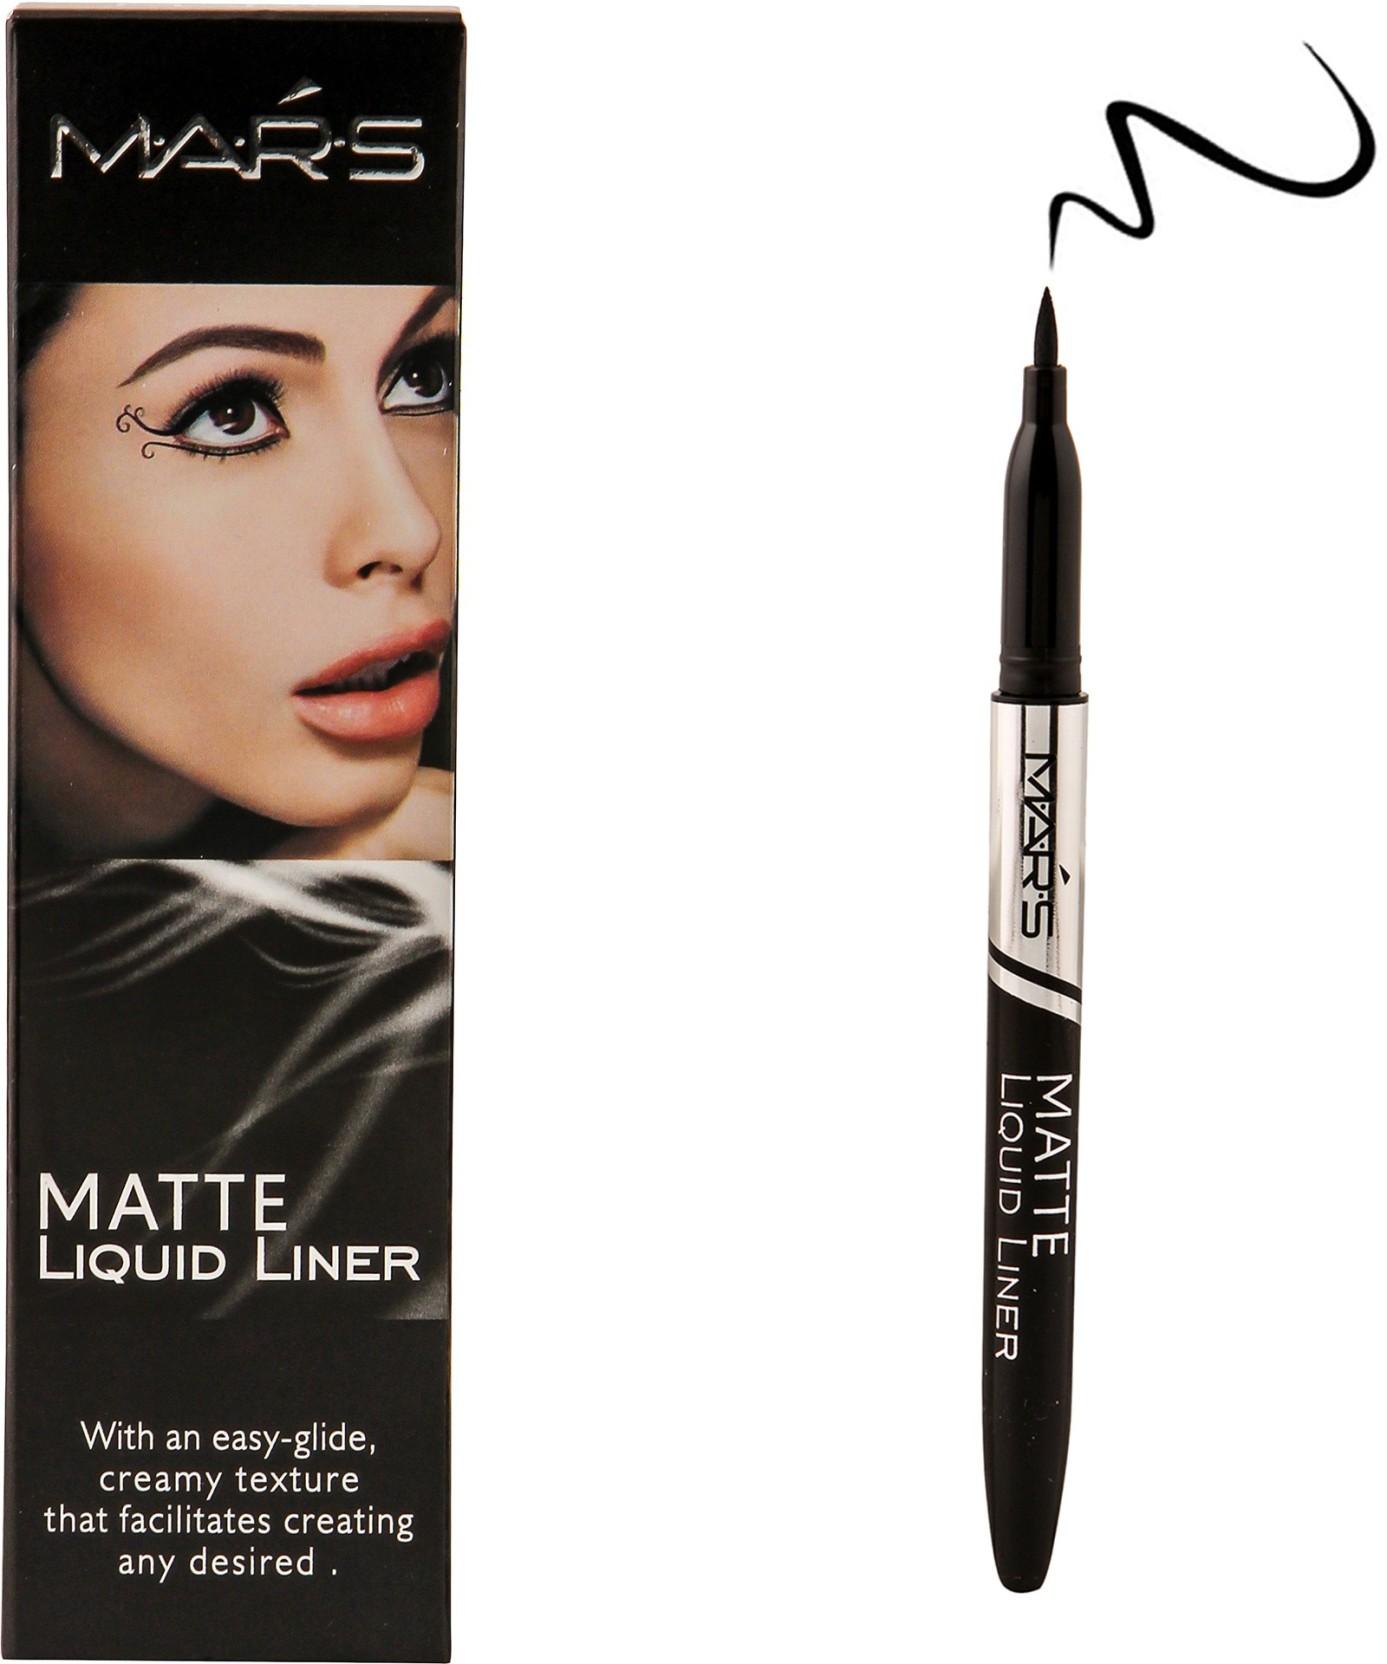 Mars Matte Smudge Proof Long Lasting Eyeliner 3 Ml Price In India Maybelline Hyper Ink Liquid Liner On Offer